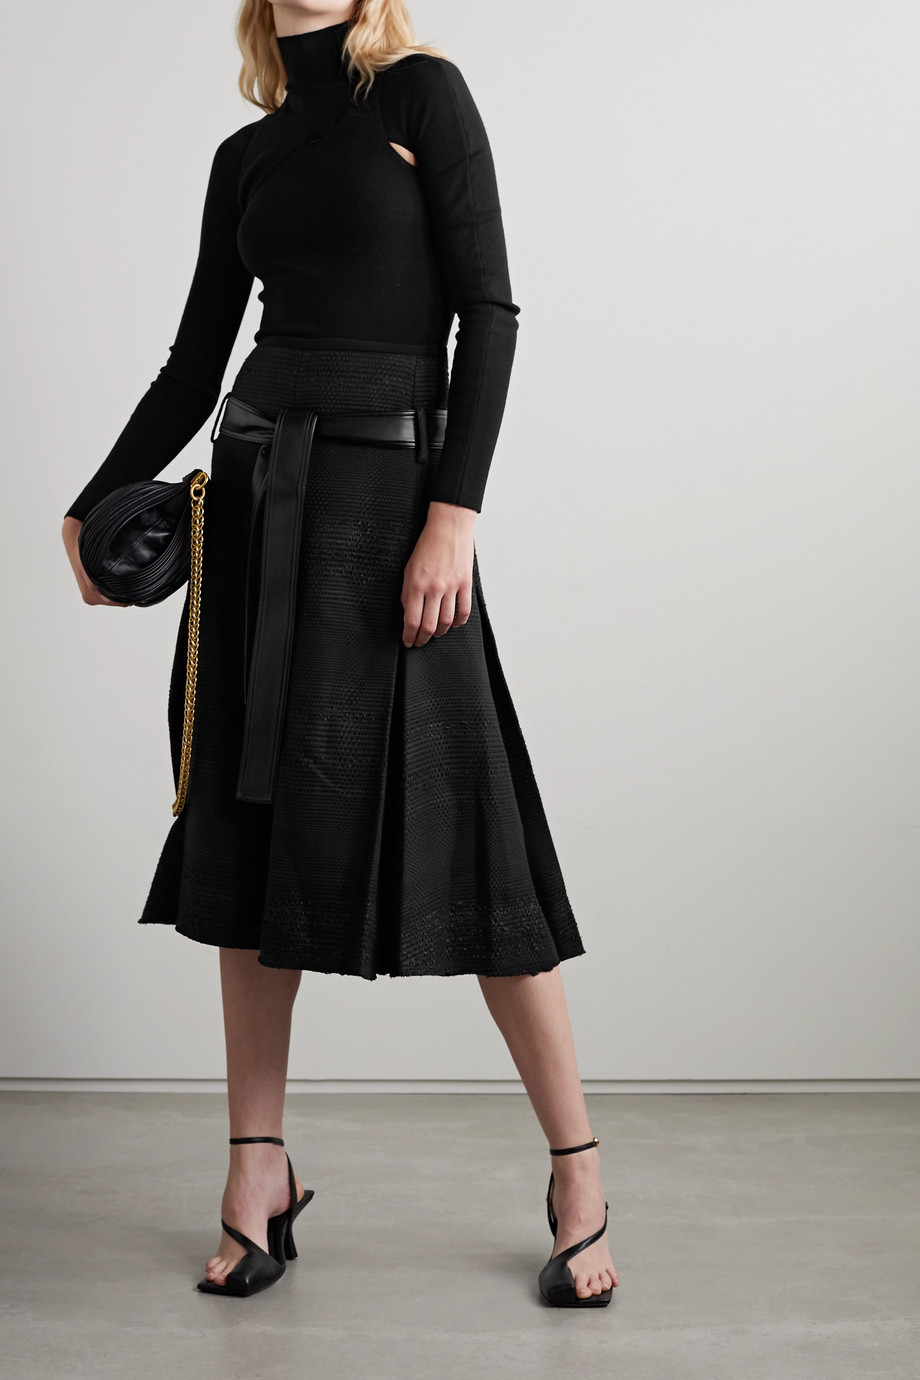 Proenza Schouler Jupe midi en tweed à finitions en cuir synthétique